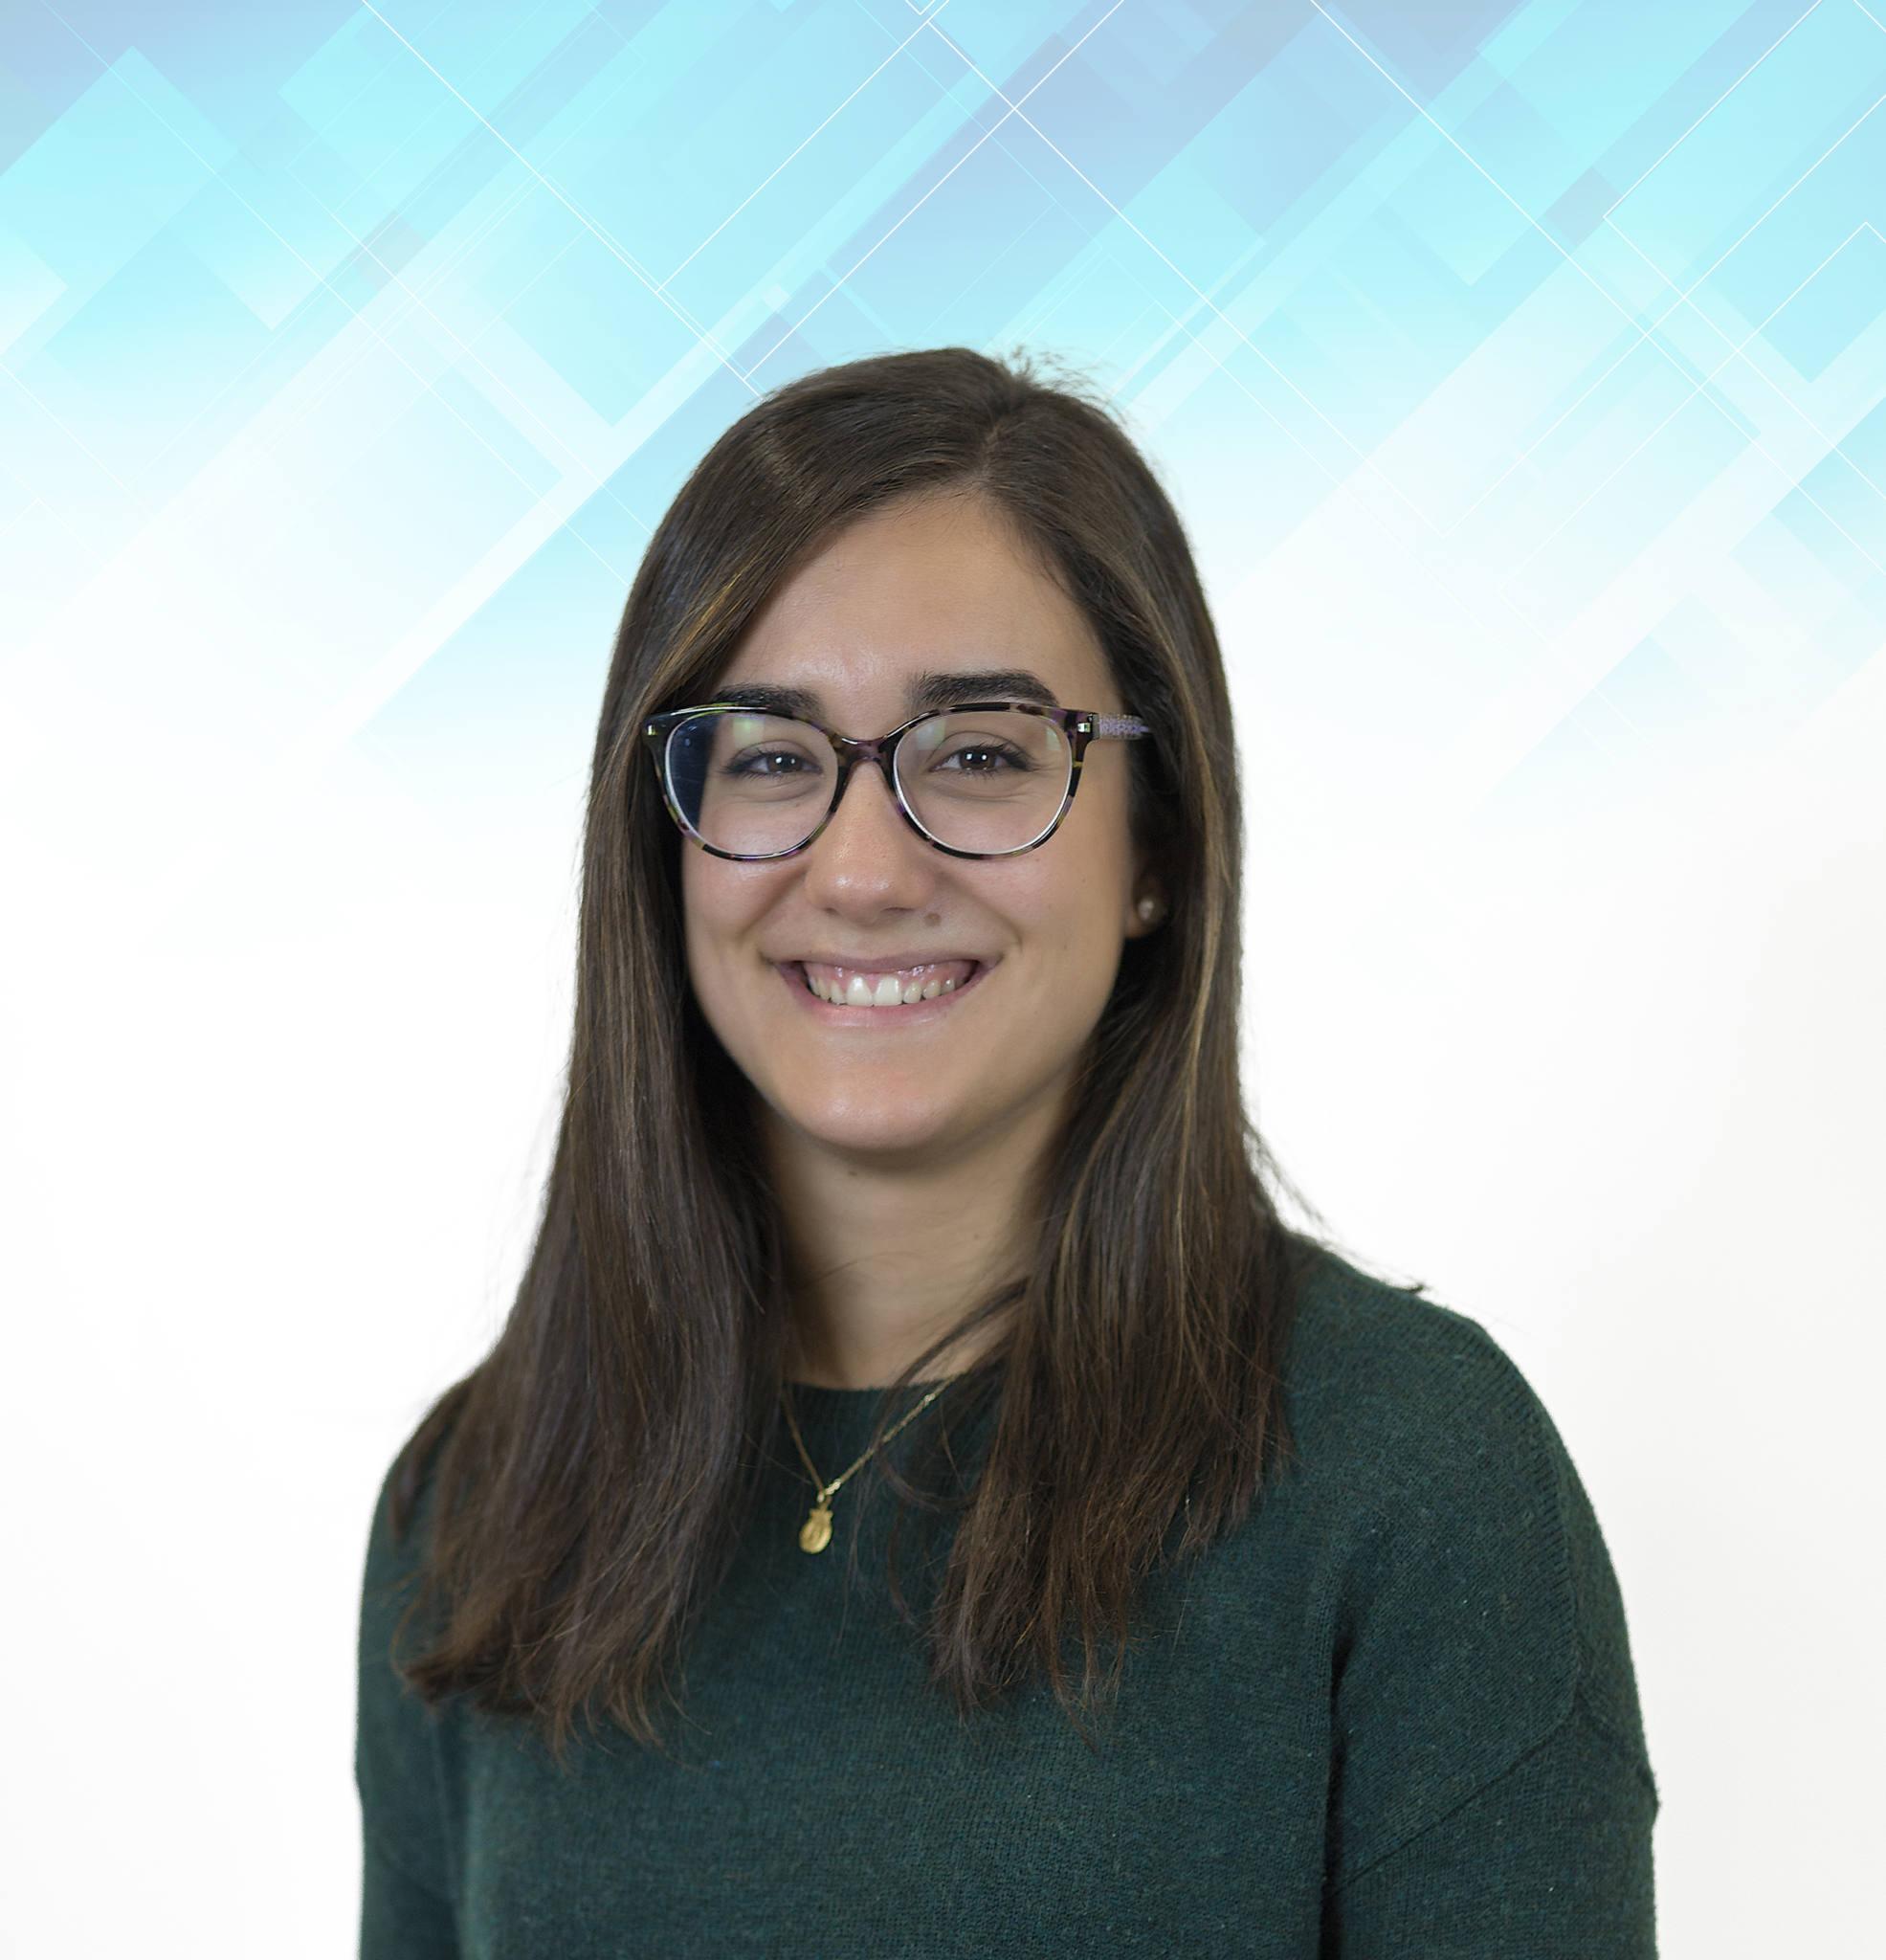 PATRICIA Glez-LAMUÑO